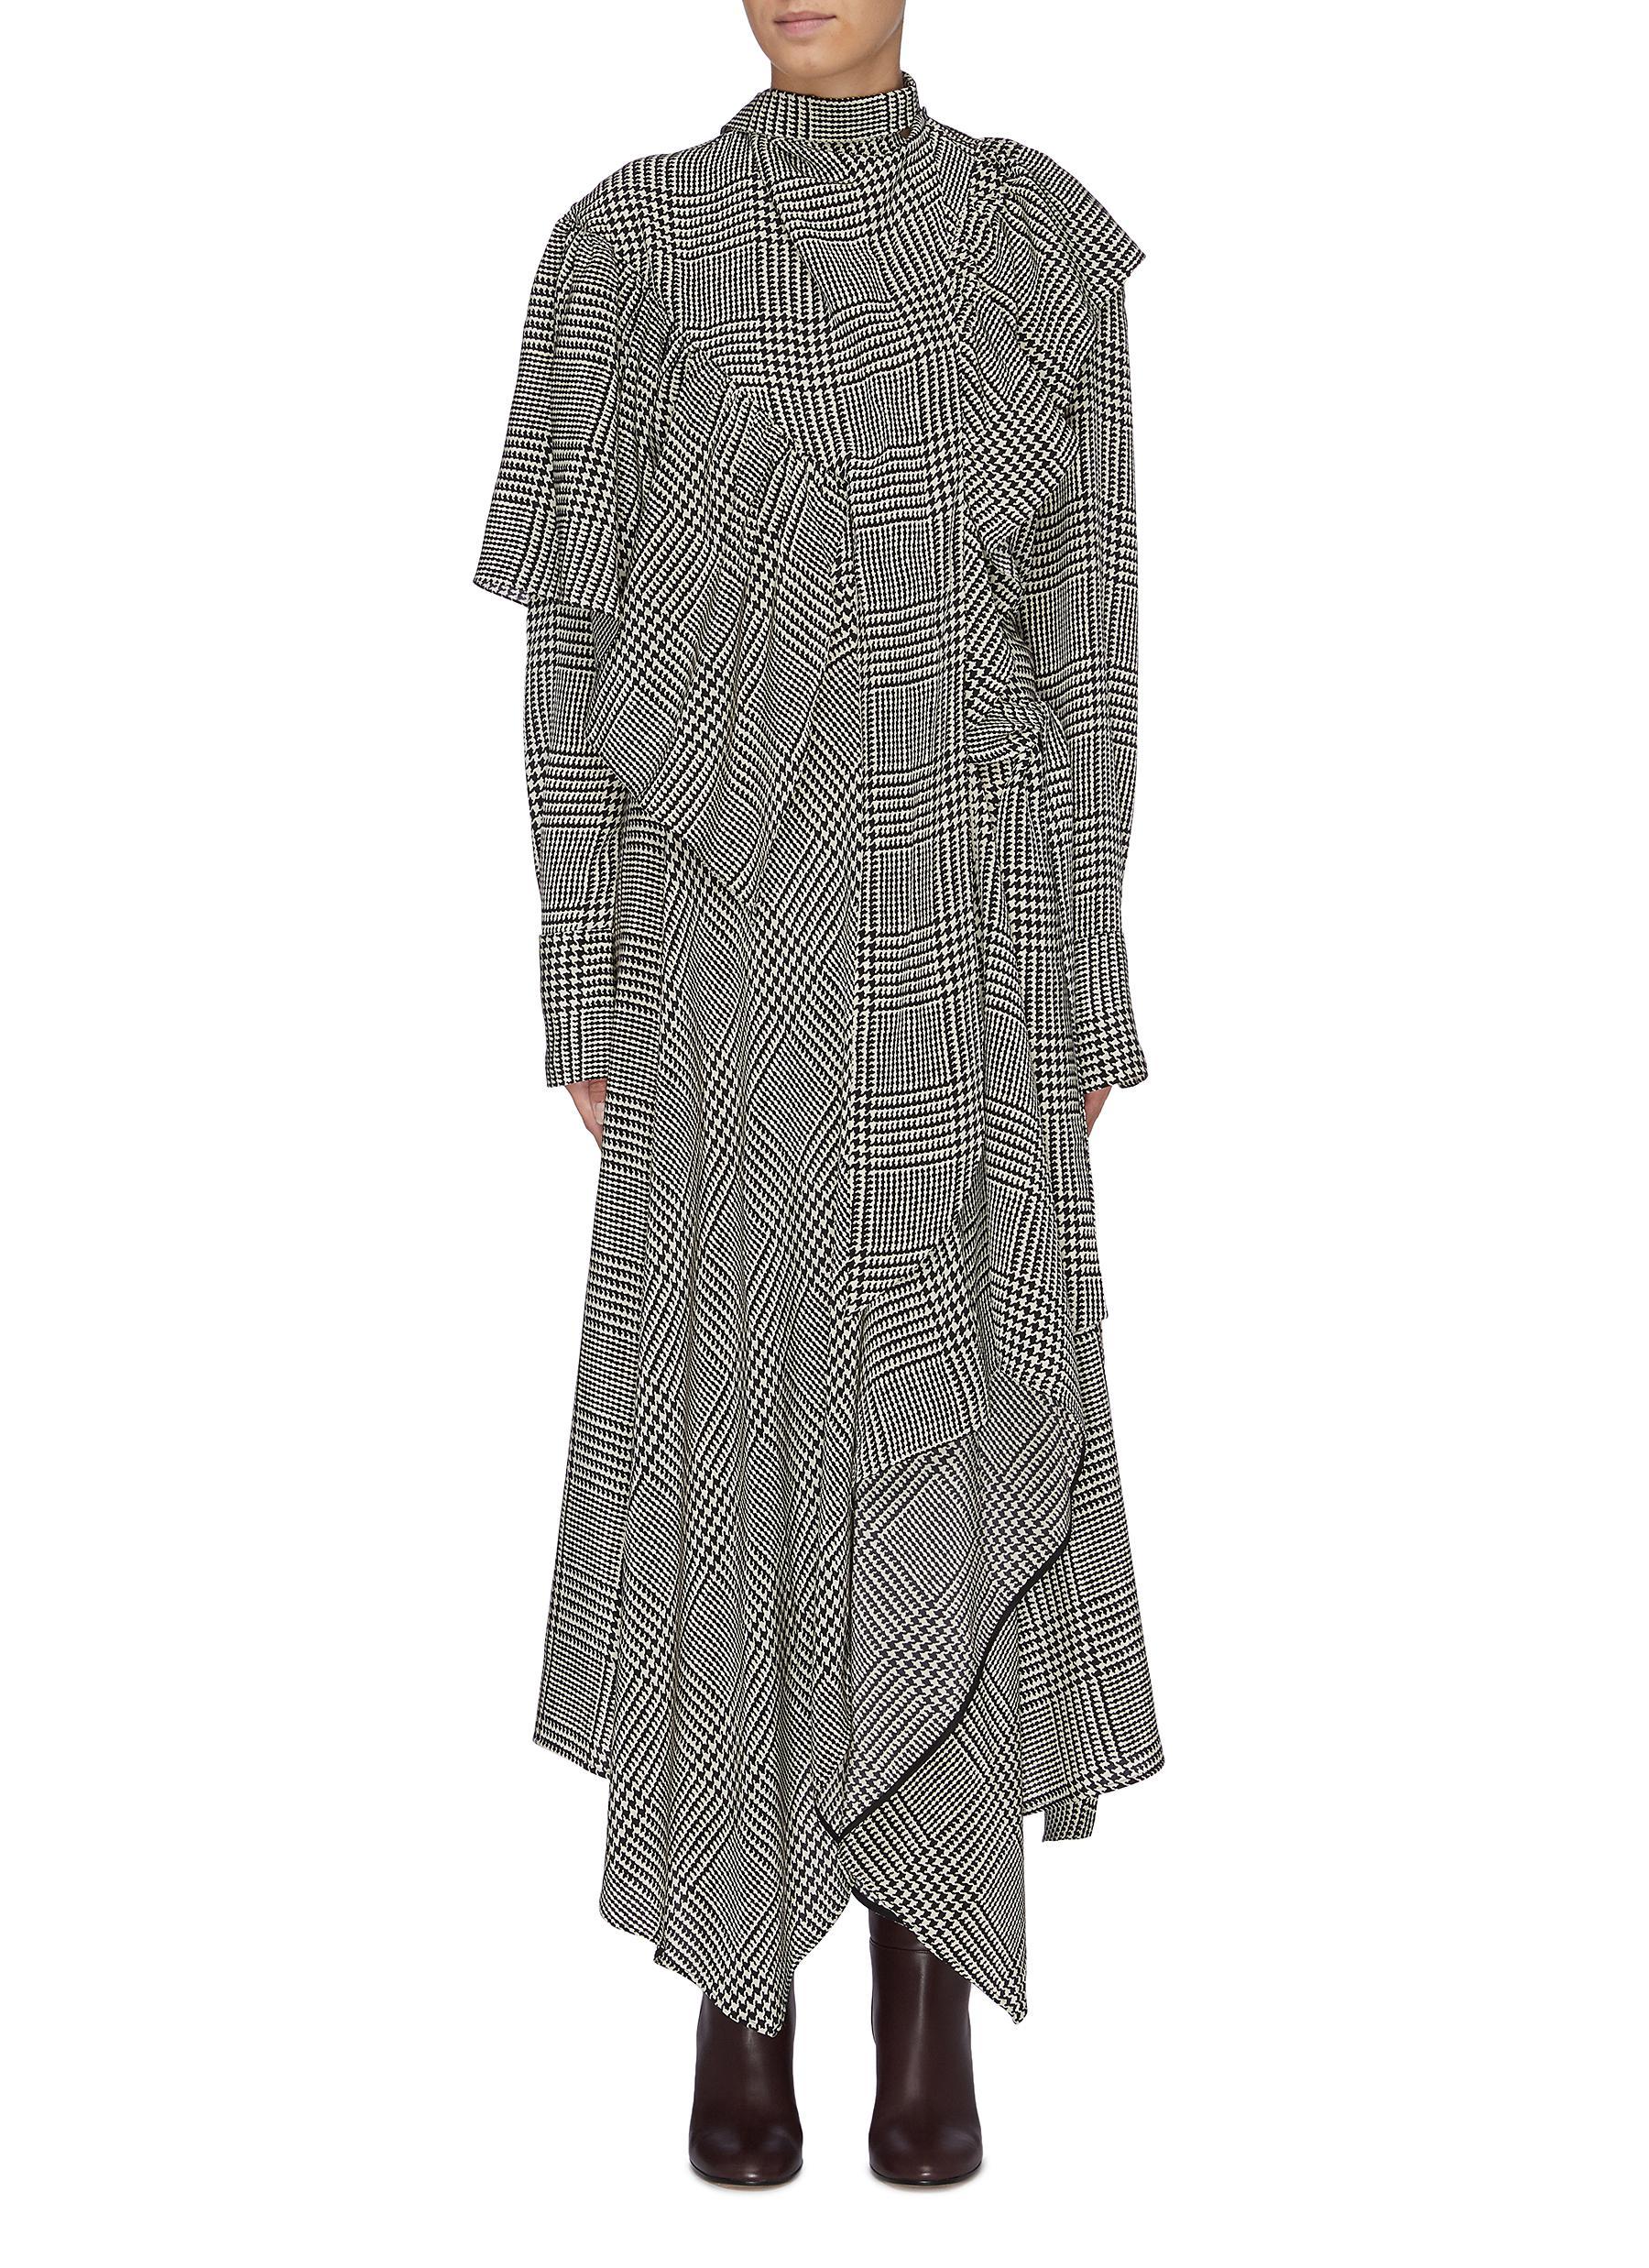 Sash tie neck asymmetric ruffle houndstooth check dress by Petar Petrov